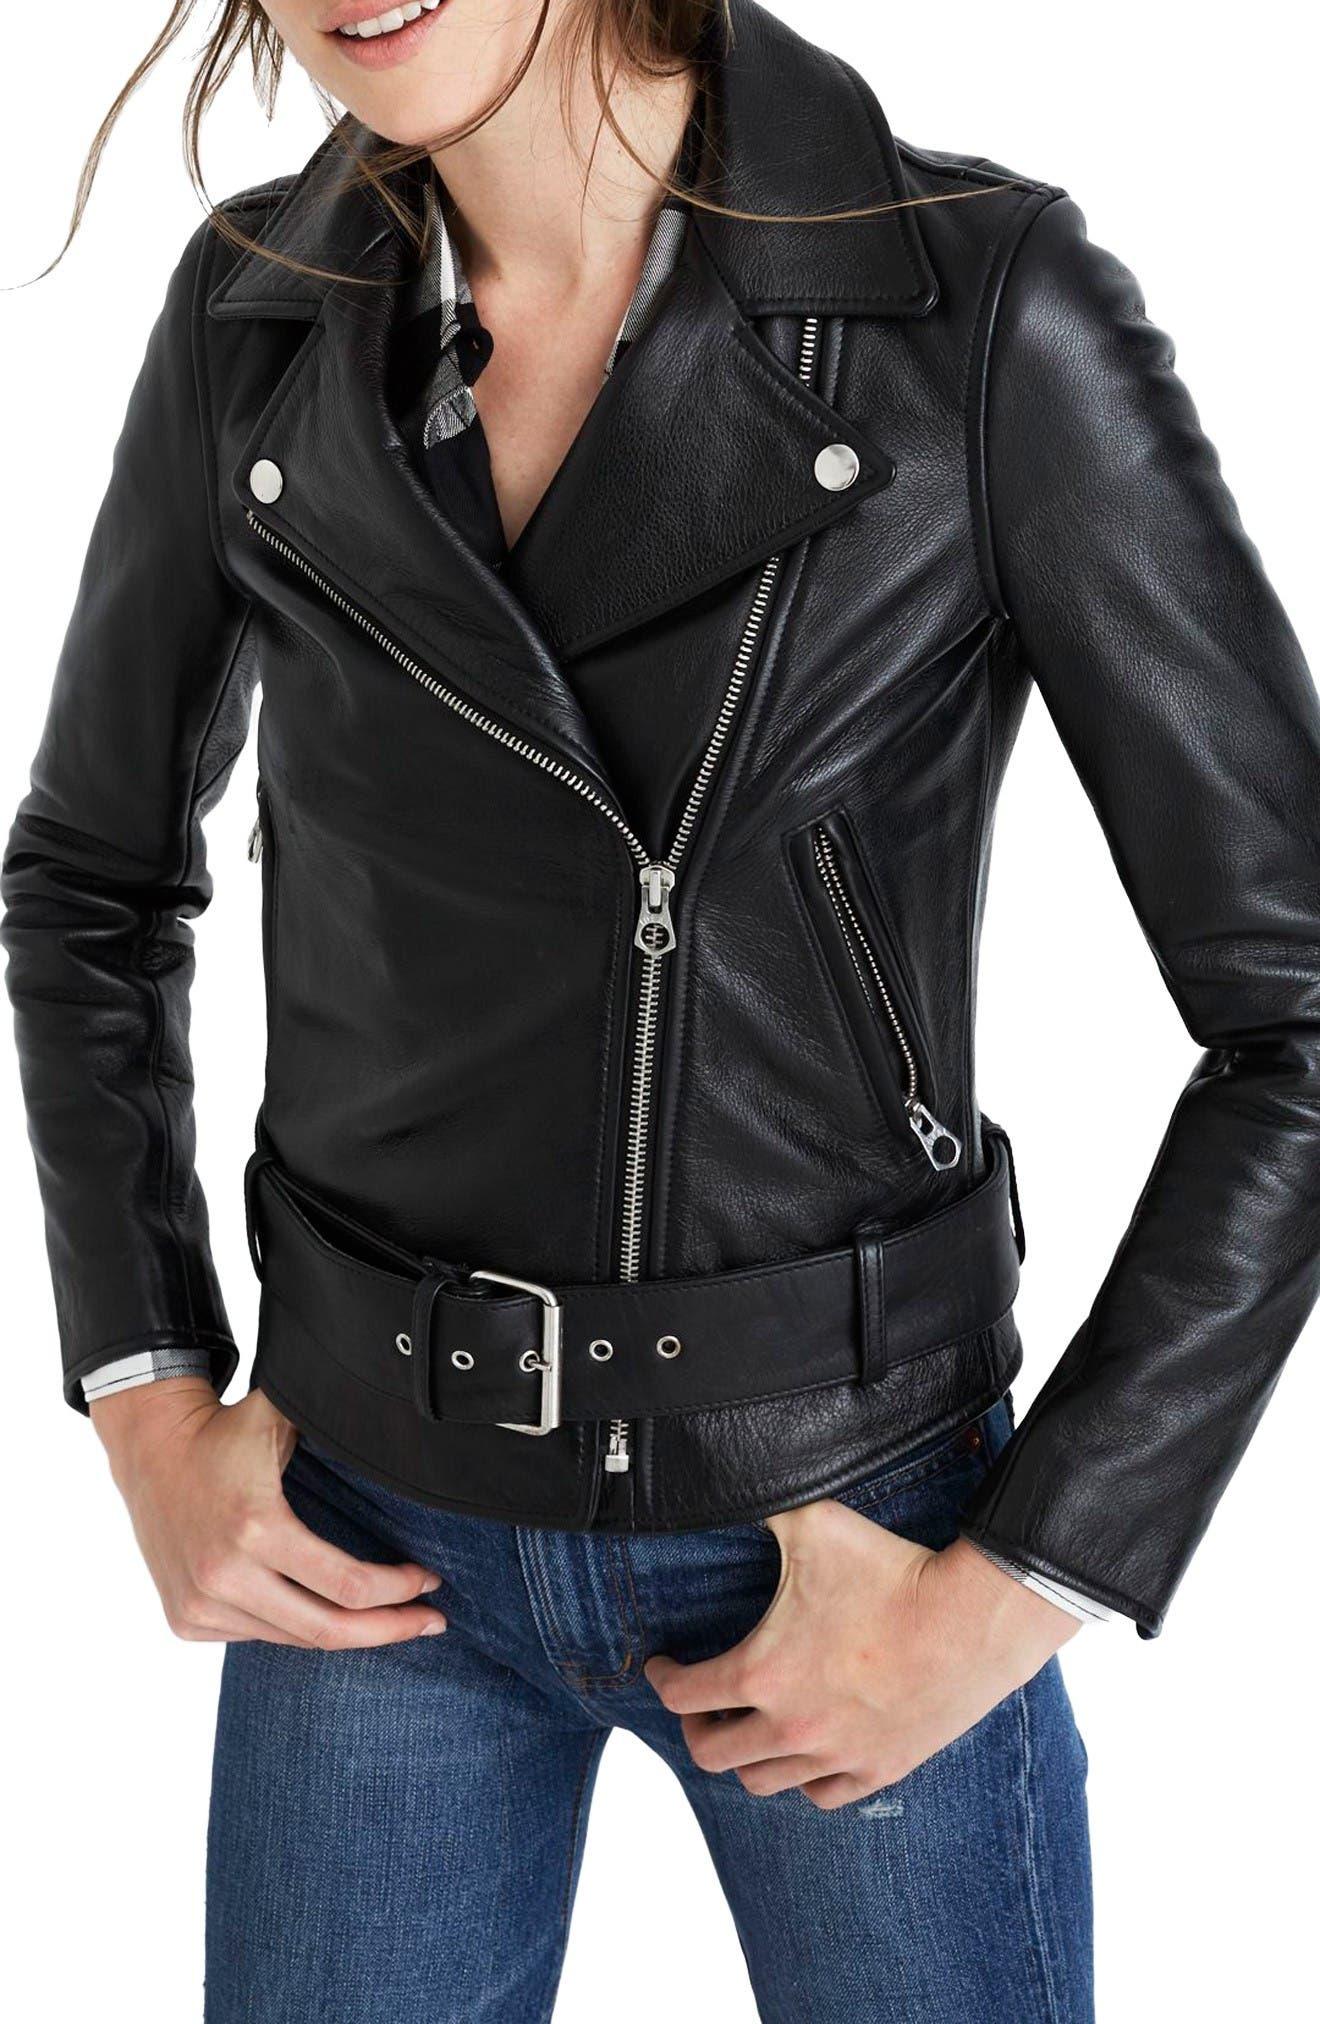 Alternate Image 1 Selected - Madewell Leather Moto Jacket